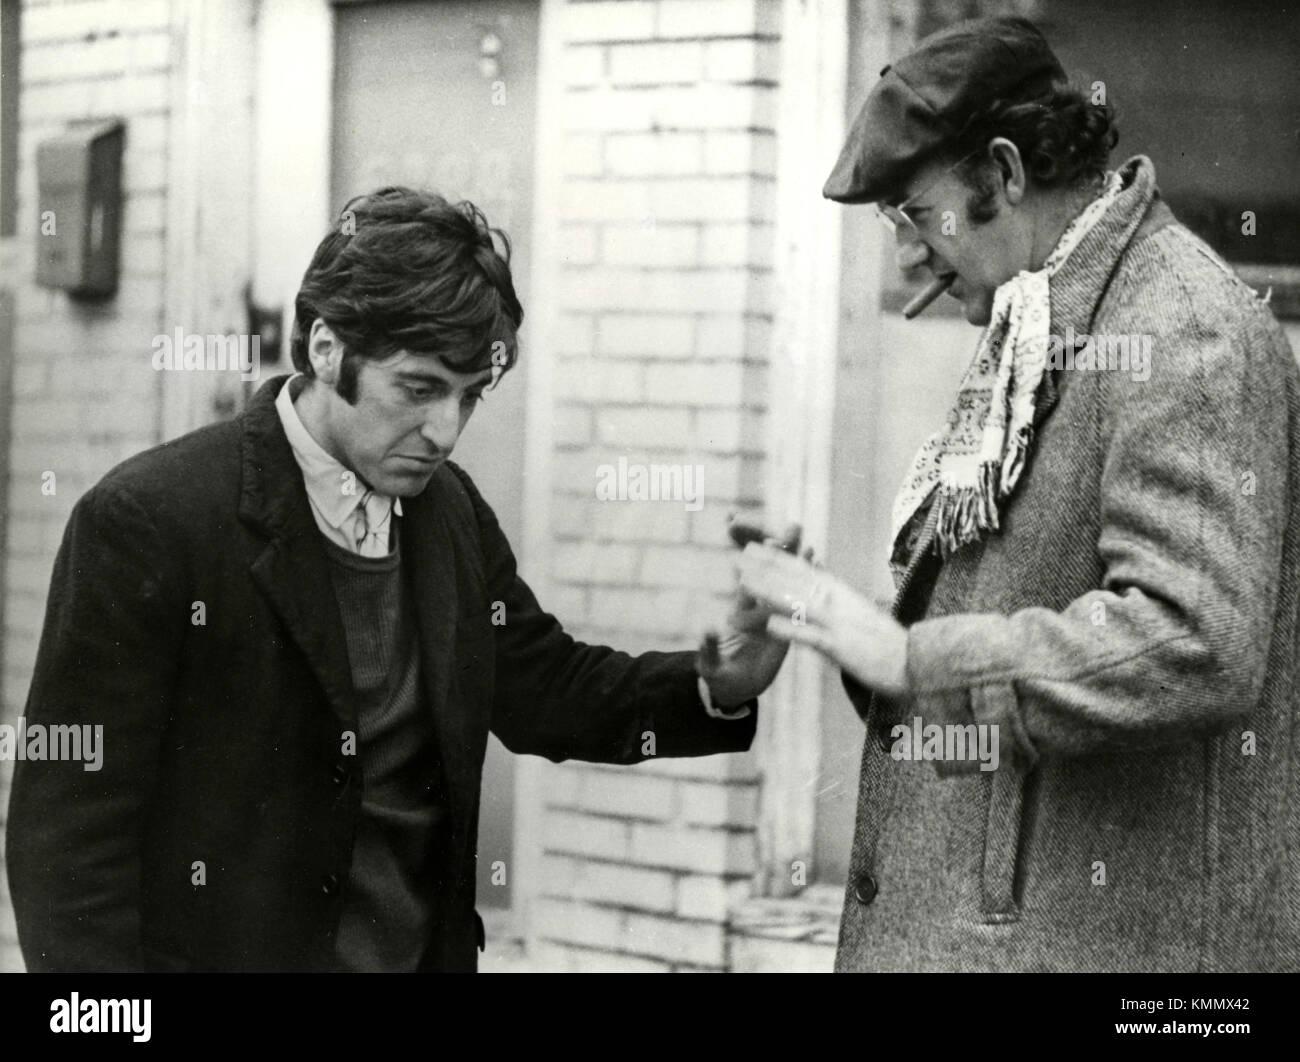 Actors Al Pacino and Gene Hackman in the movie Scarecrow, USA 1973 - Stock Image